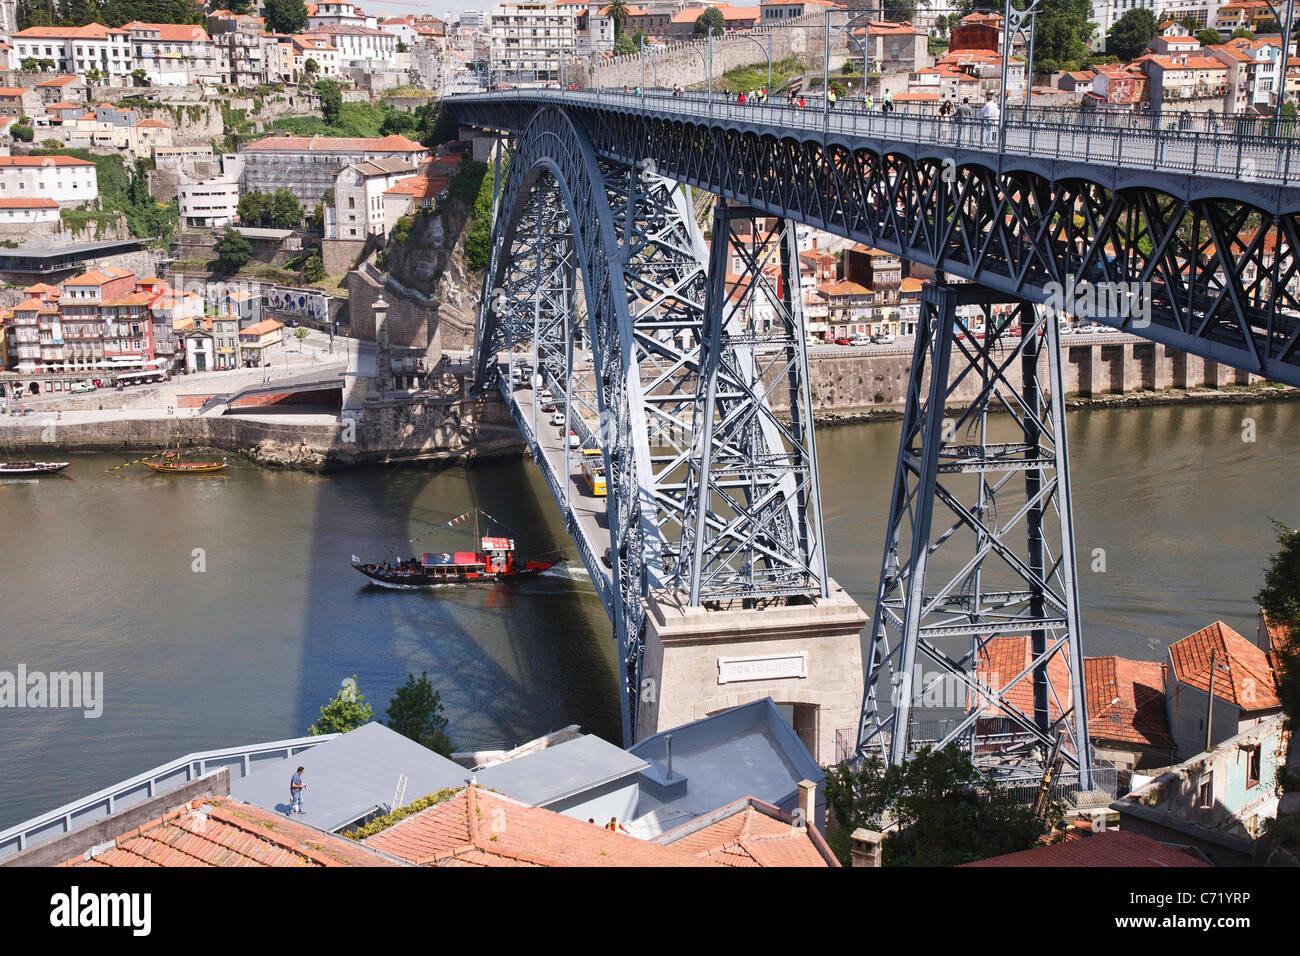 Ponte Dom Luis, iron railway and road bridge built by Eiffel over River Douro, Porto - Stock Image